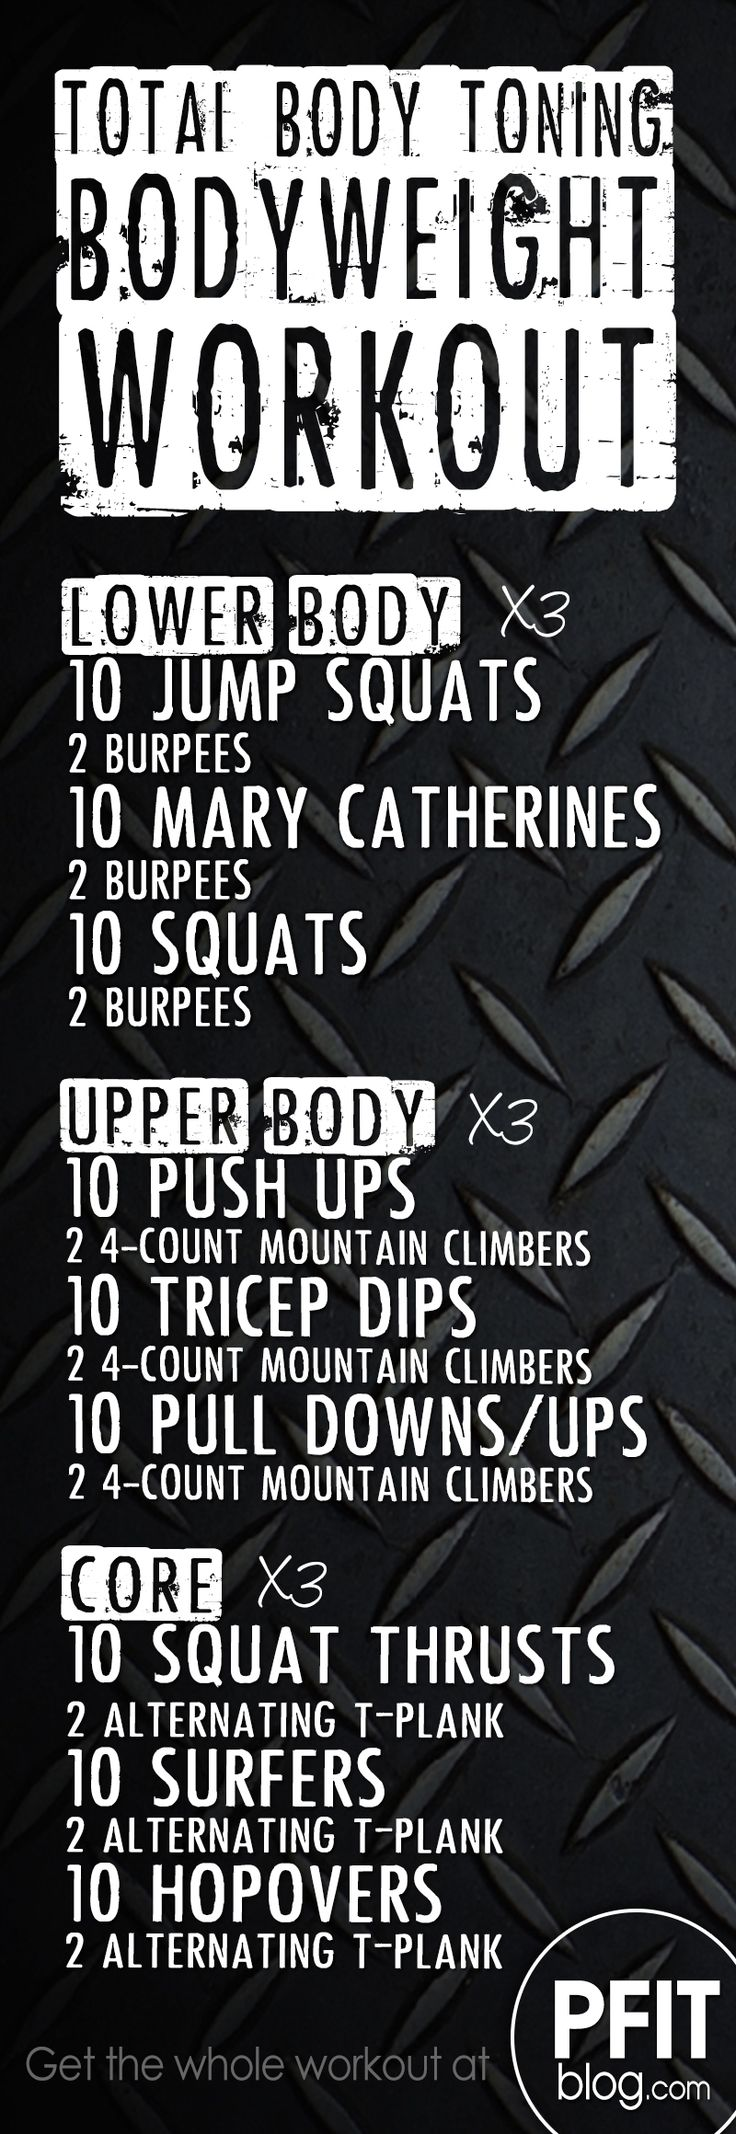 FAT-BLASTING, BODY TONING BODYWEIGHT WORKOUT - #PFITblog #Fitness #FitFluential #workout #gym